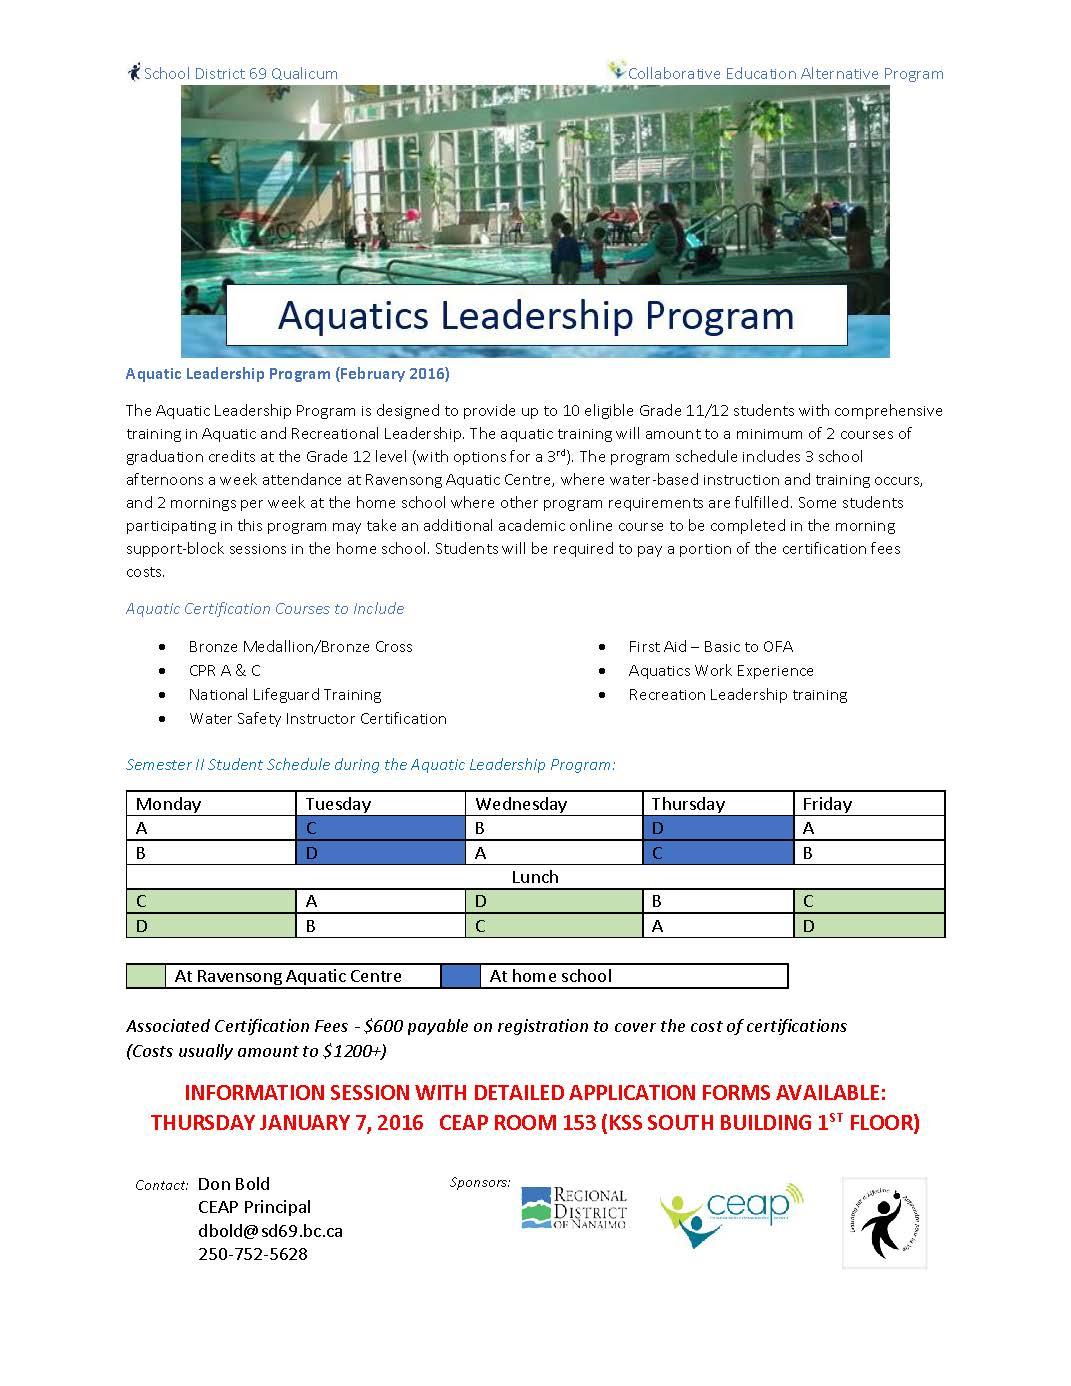 Aquatics leadership program collaborative education alternative aquatic leadership program 15 16 info sheetg xflitez Image collections